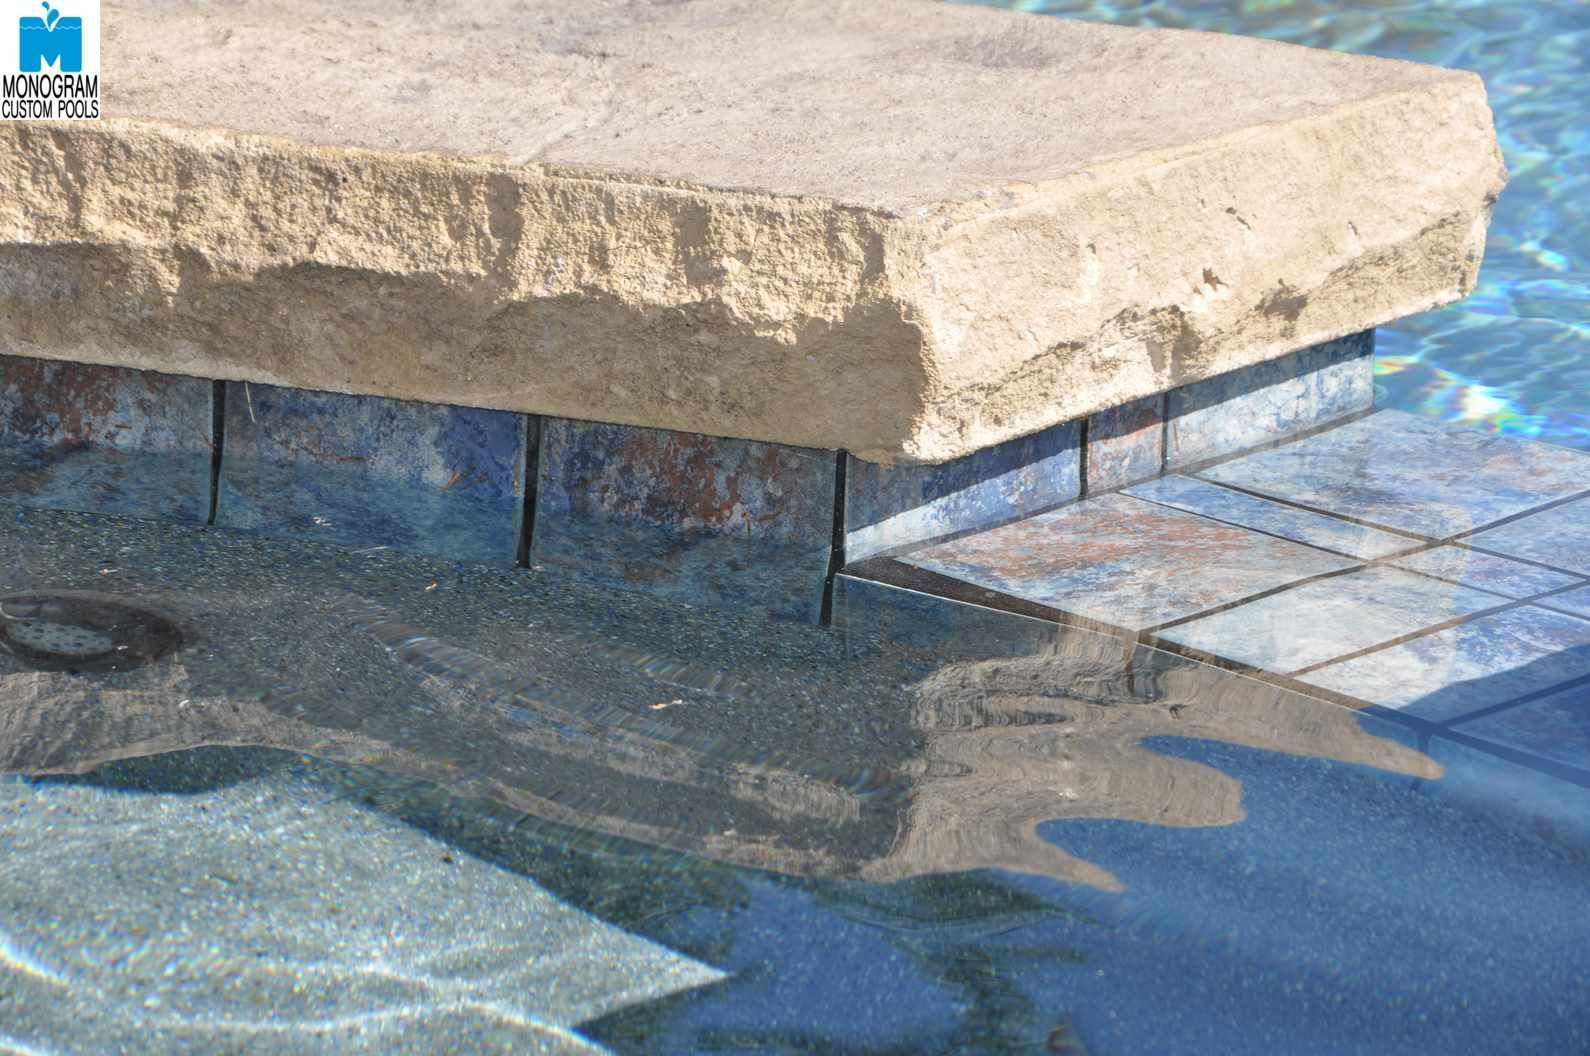 aztec cobalt tile pool tile pool